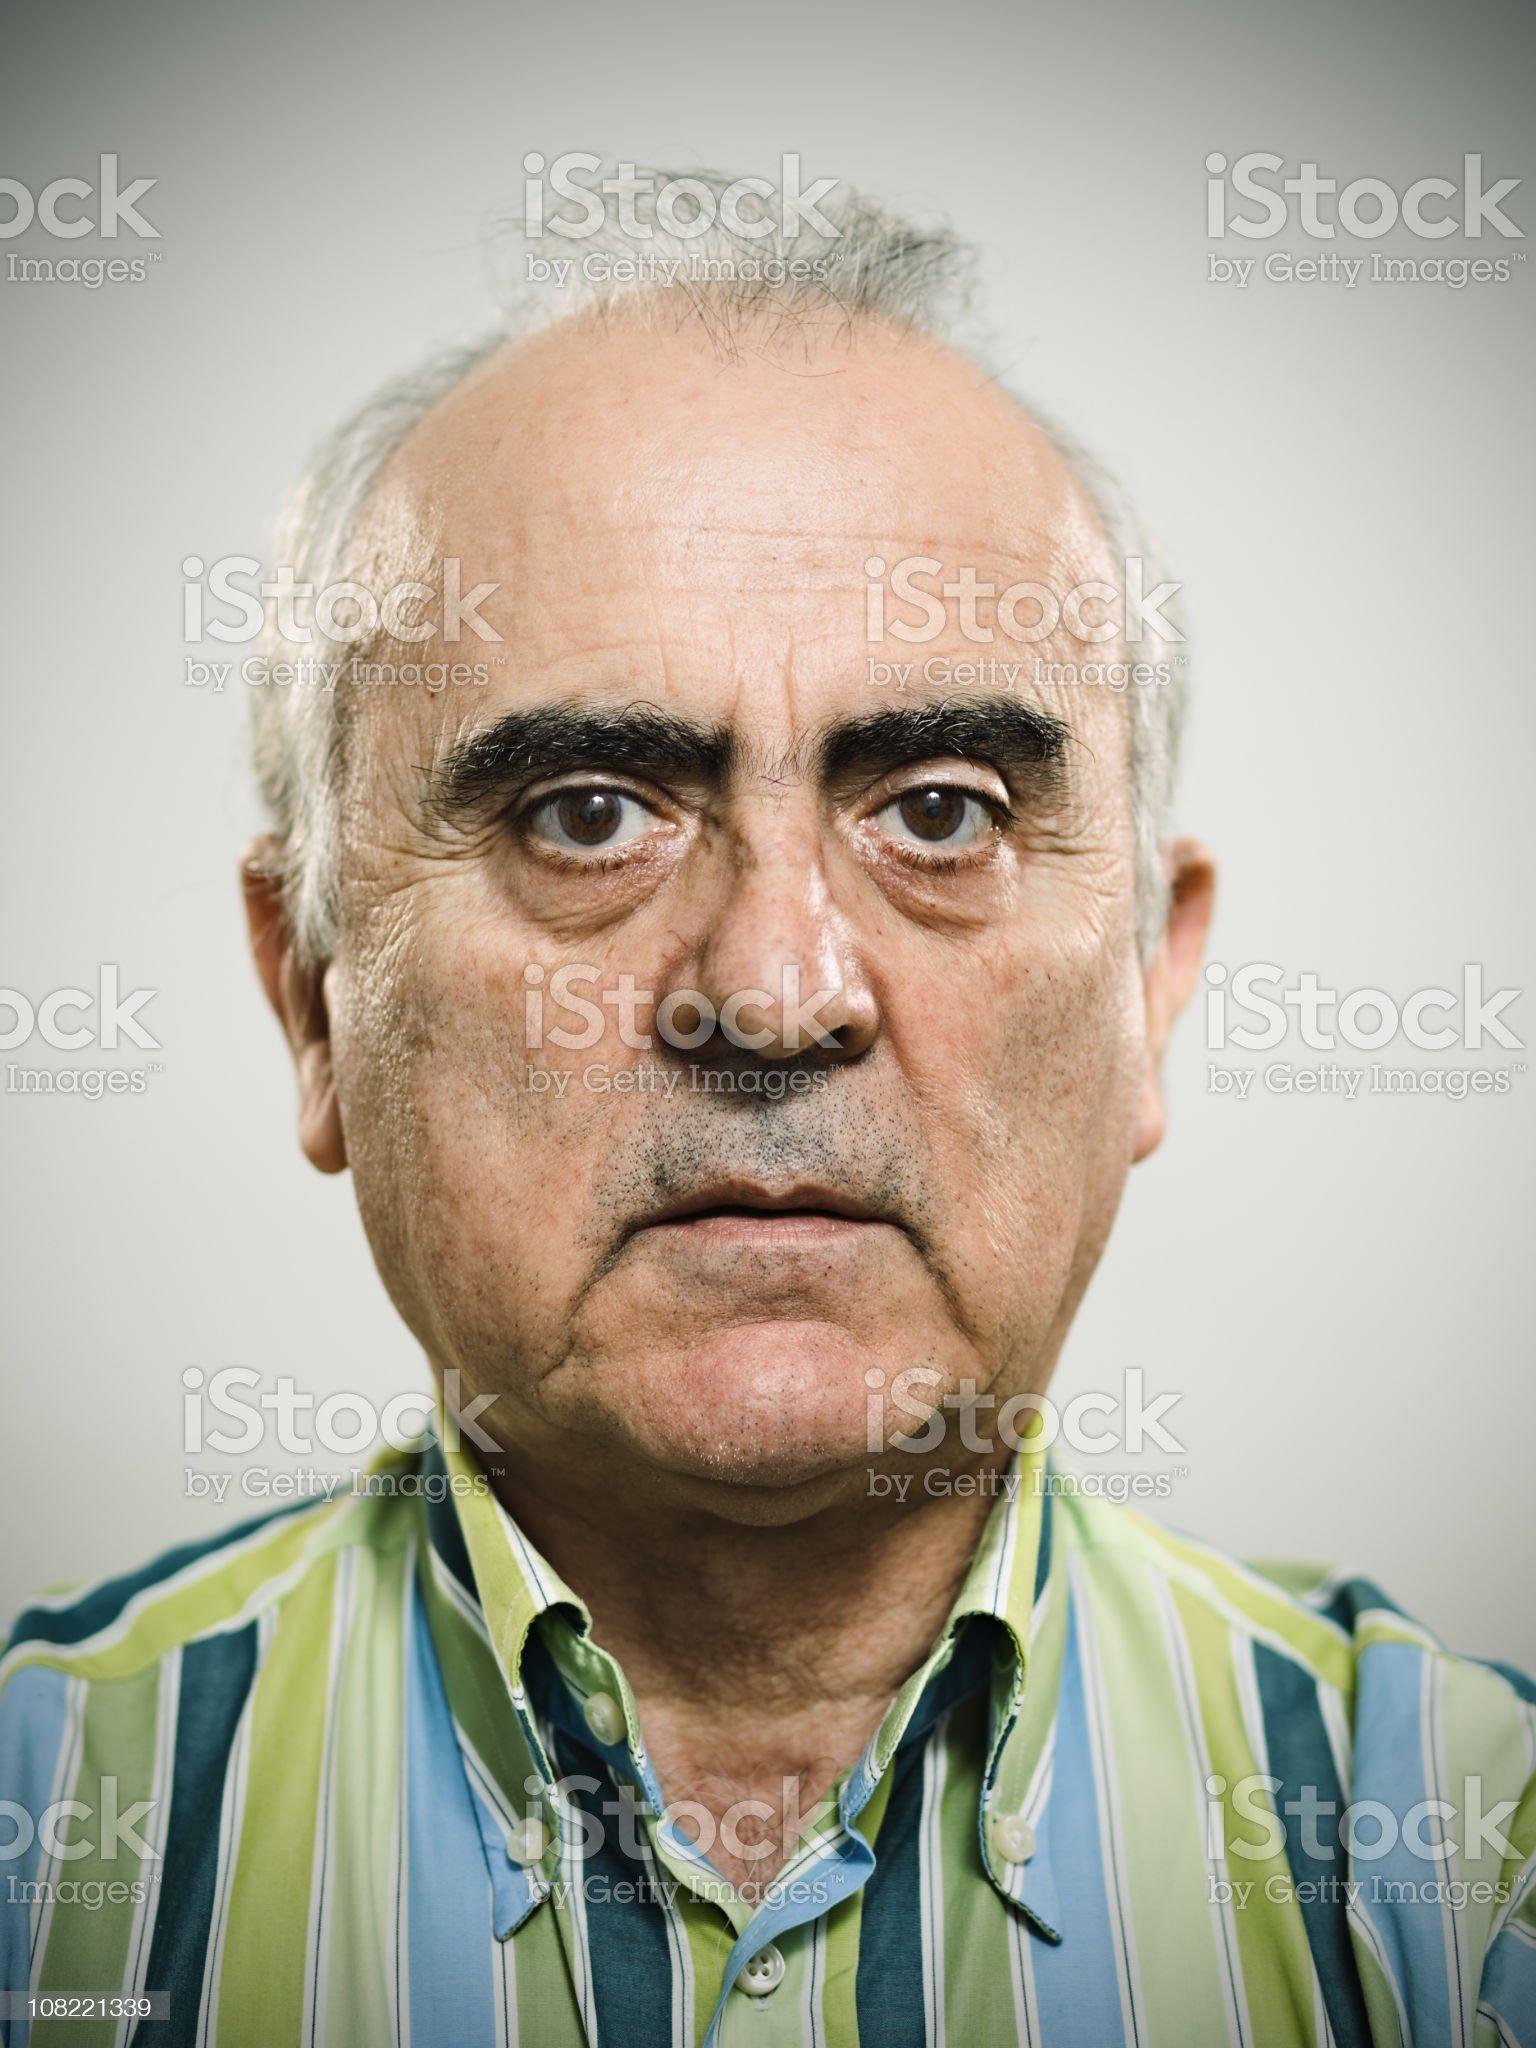 Real mature man royalty-free stock photo